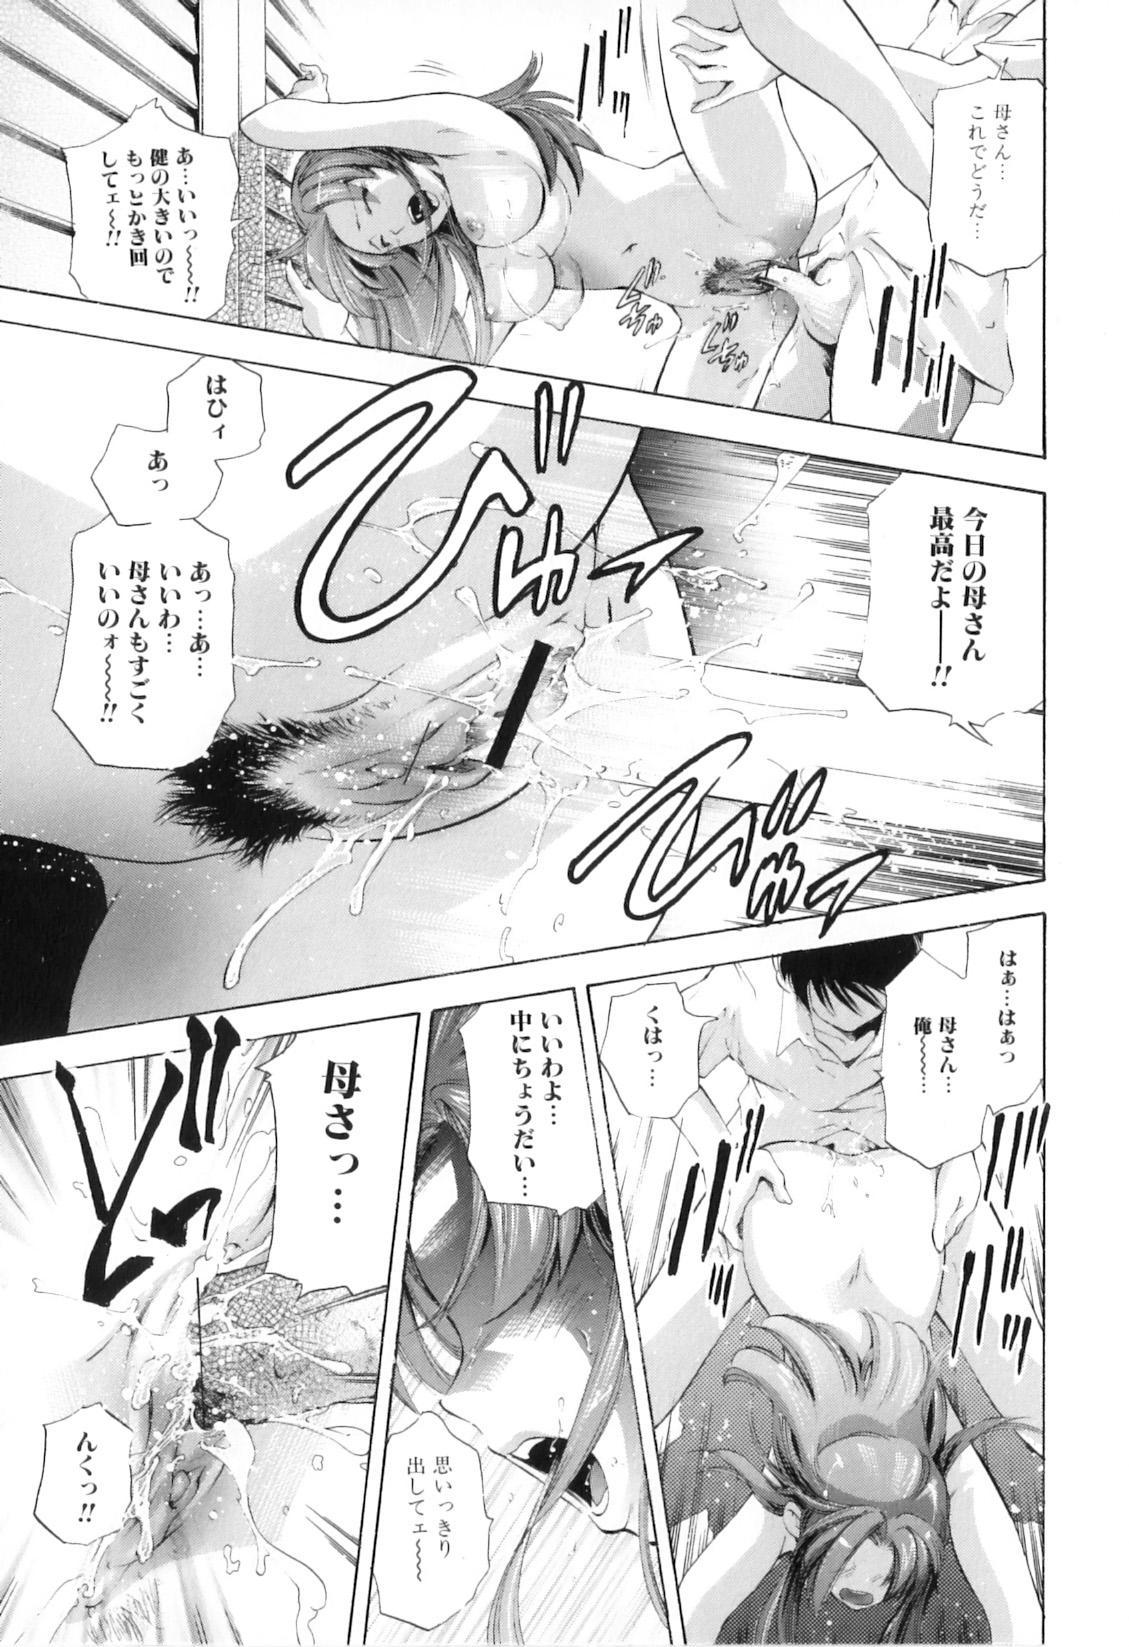 Boshi Chijou Kitan 16